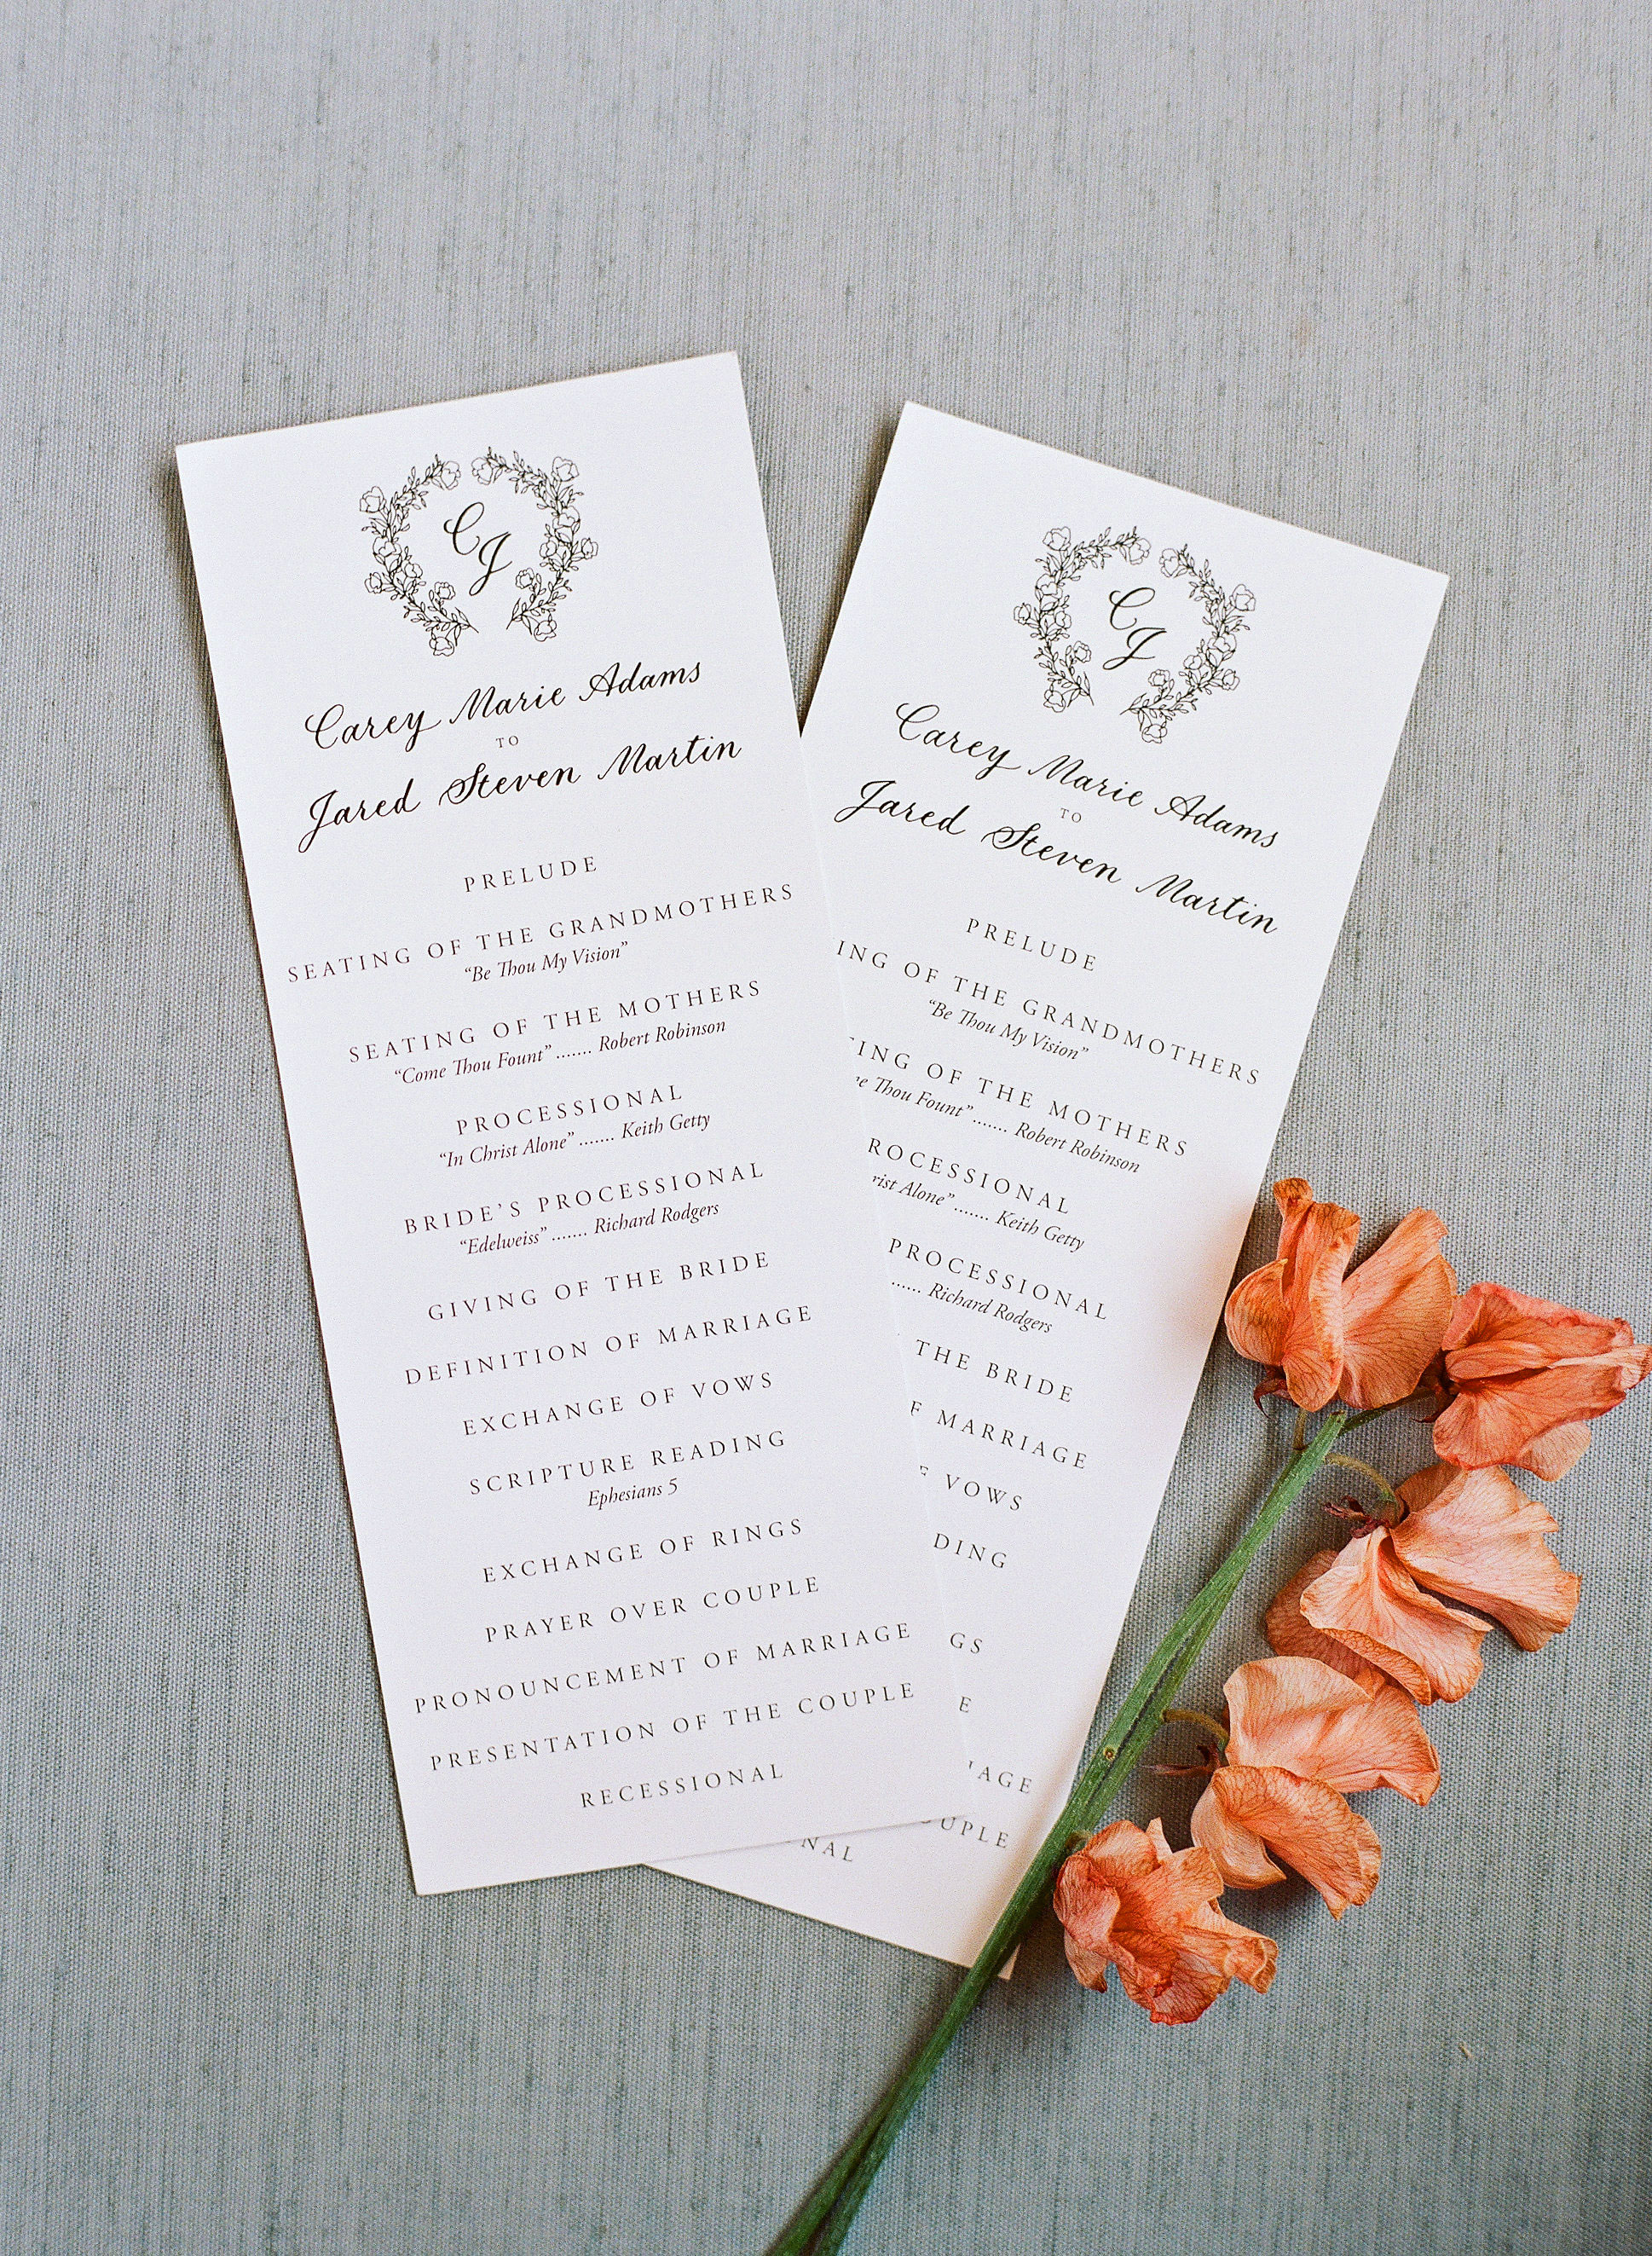 carey jared wedding programs